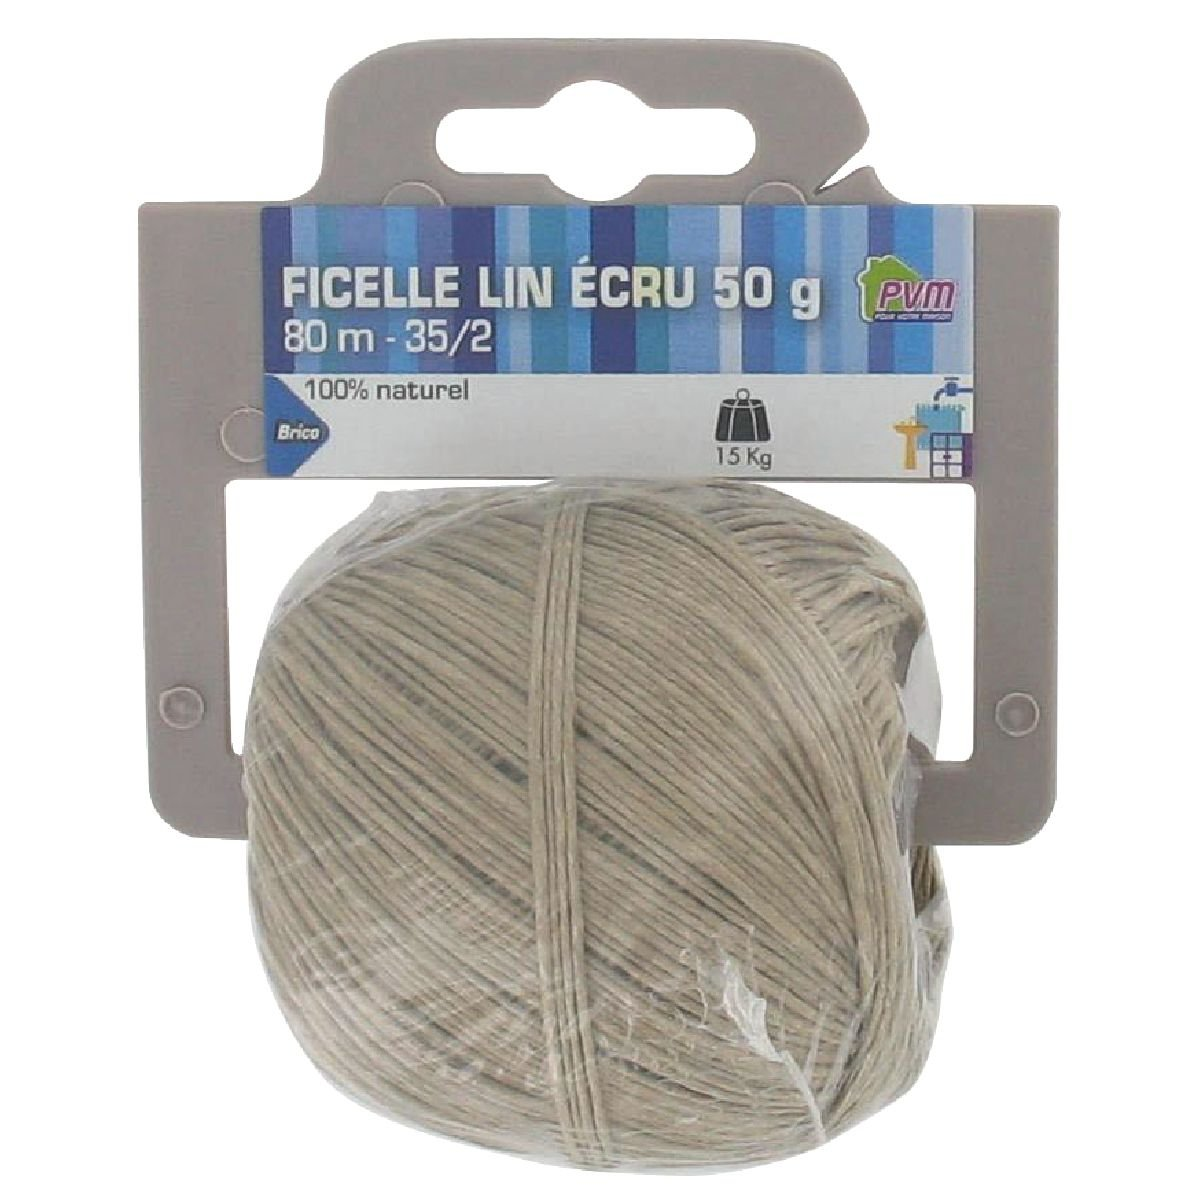 Diam/è tre 1 mm Bricodeal Longueur 80 m Ficelle lin /é cru PVM